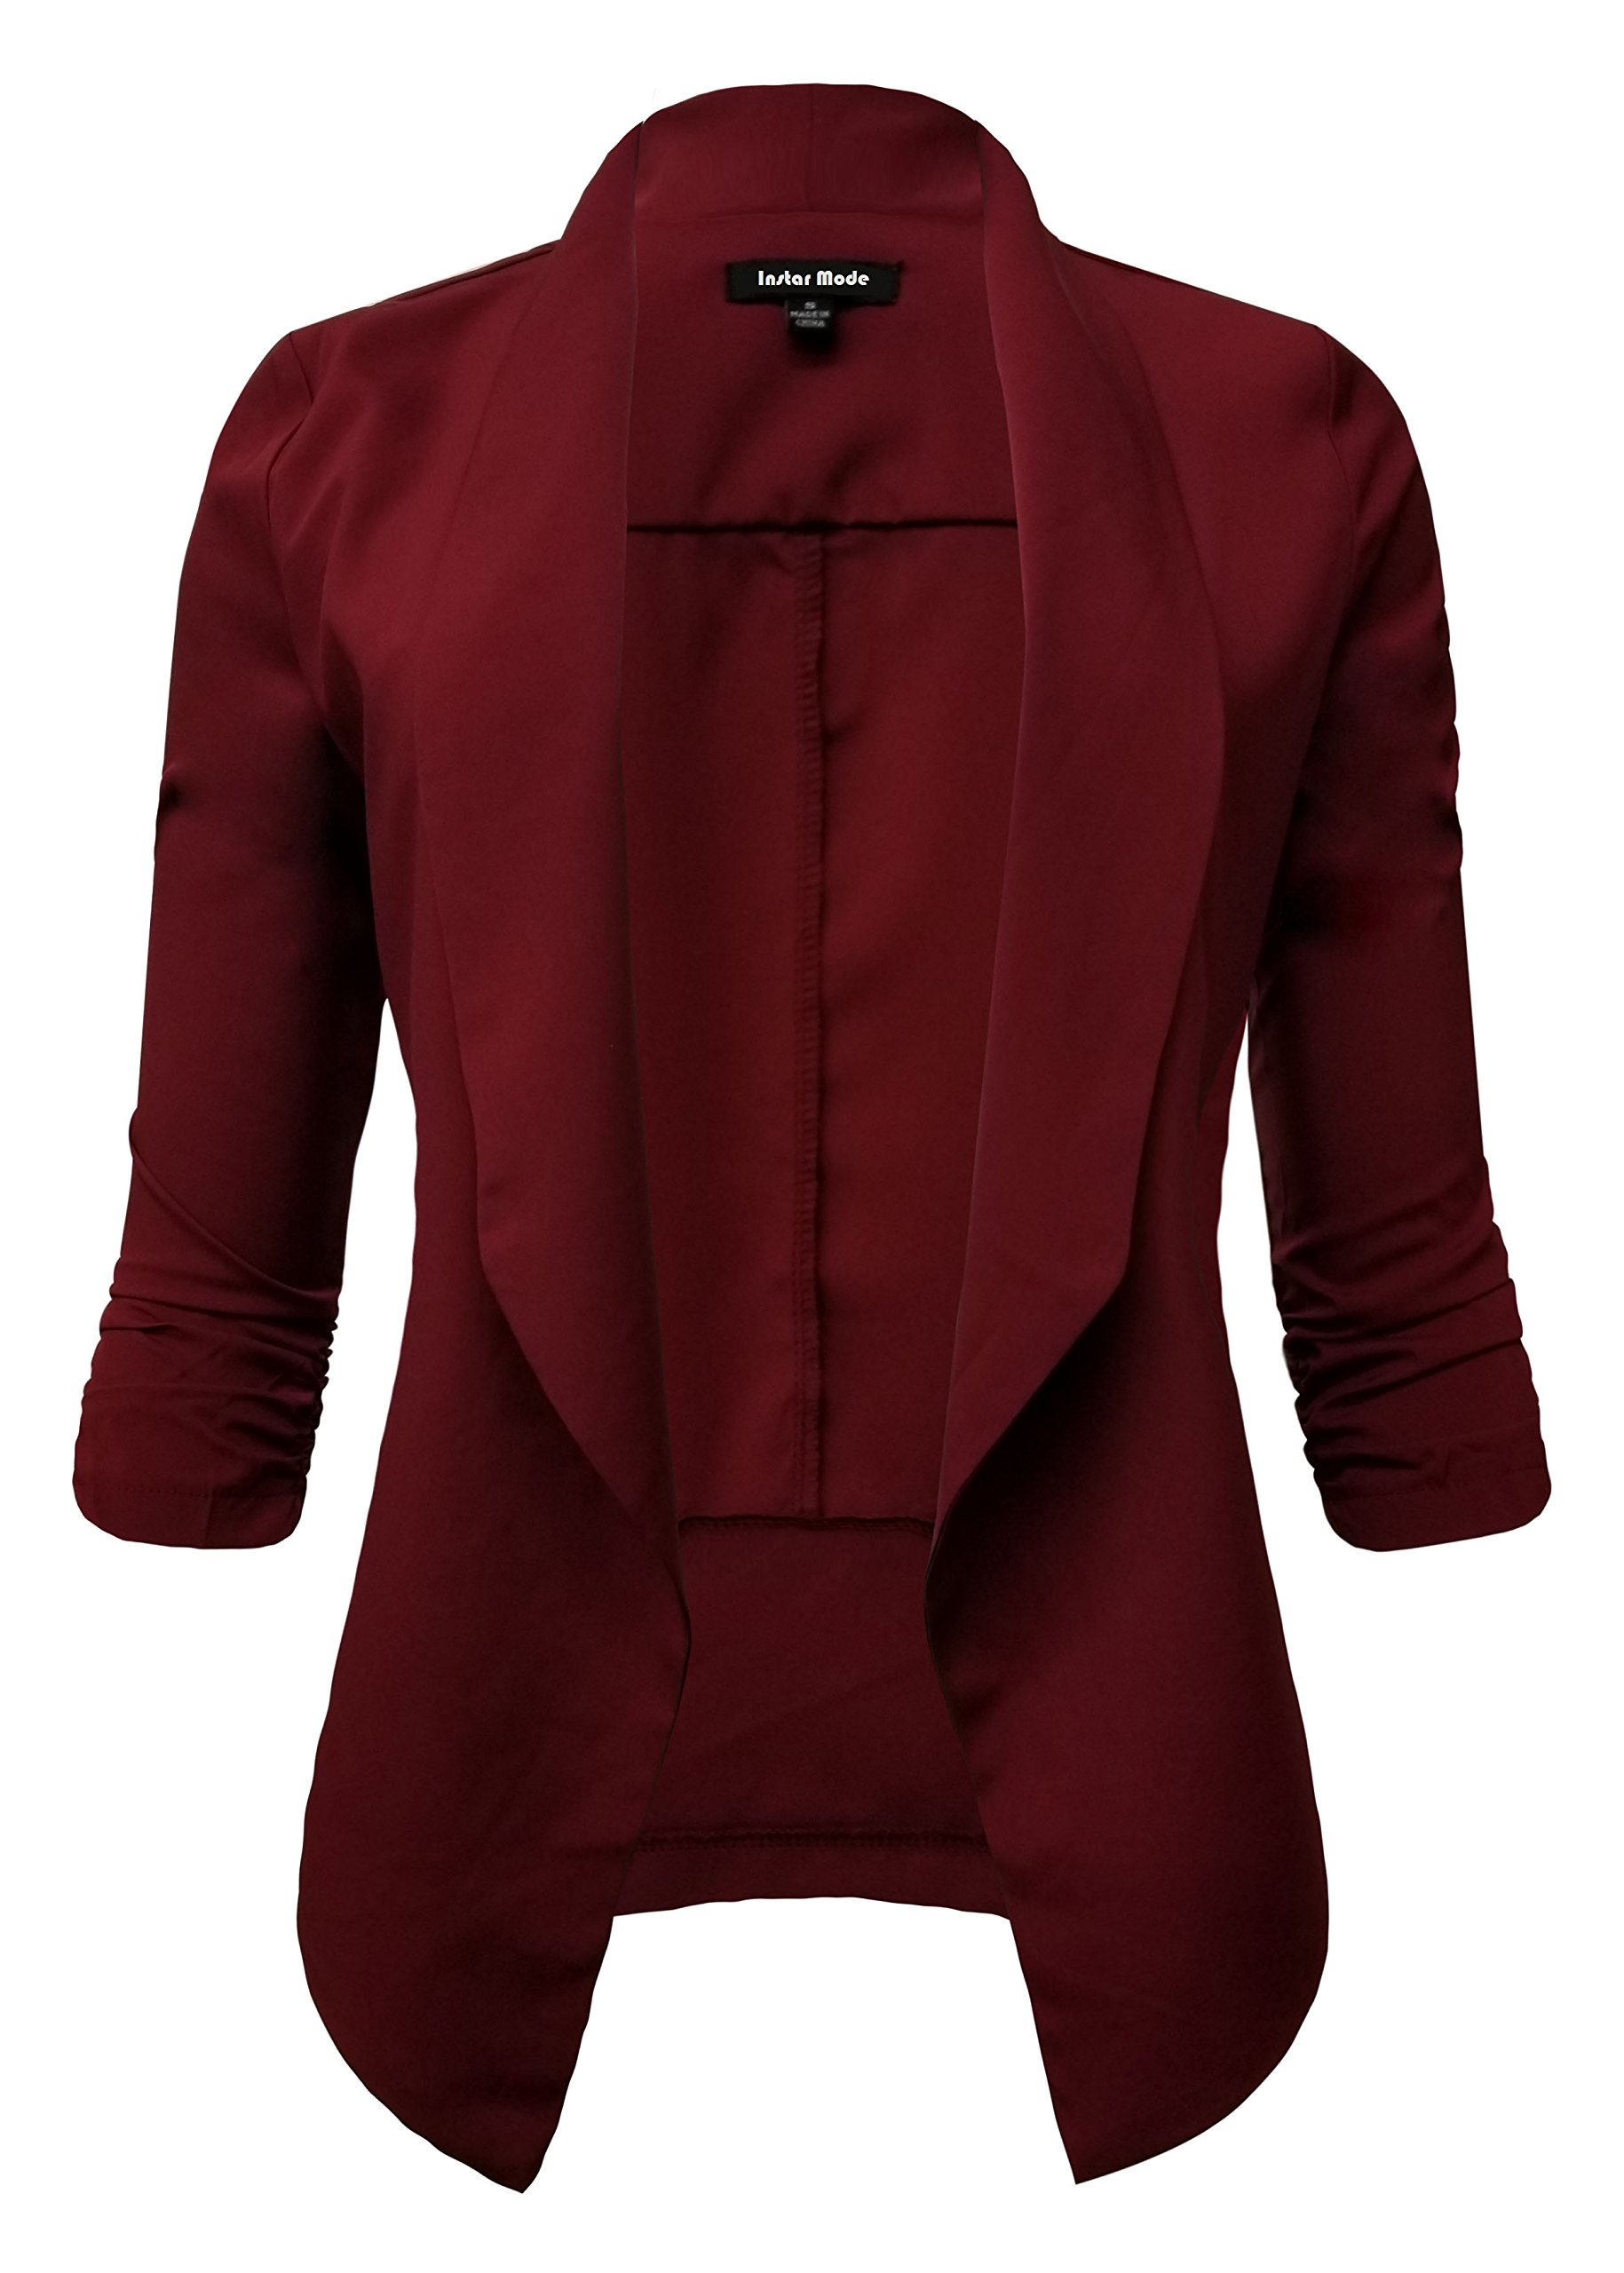 Instar Mode Women's Lightweight Fly Away Thin Chiffon Ruched Sleeve Opened Blazer (B610117 Burgundy, Medium)